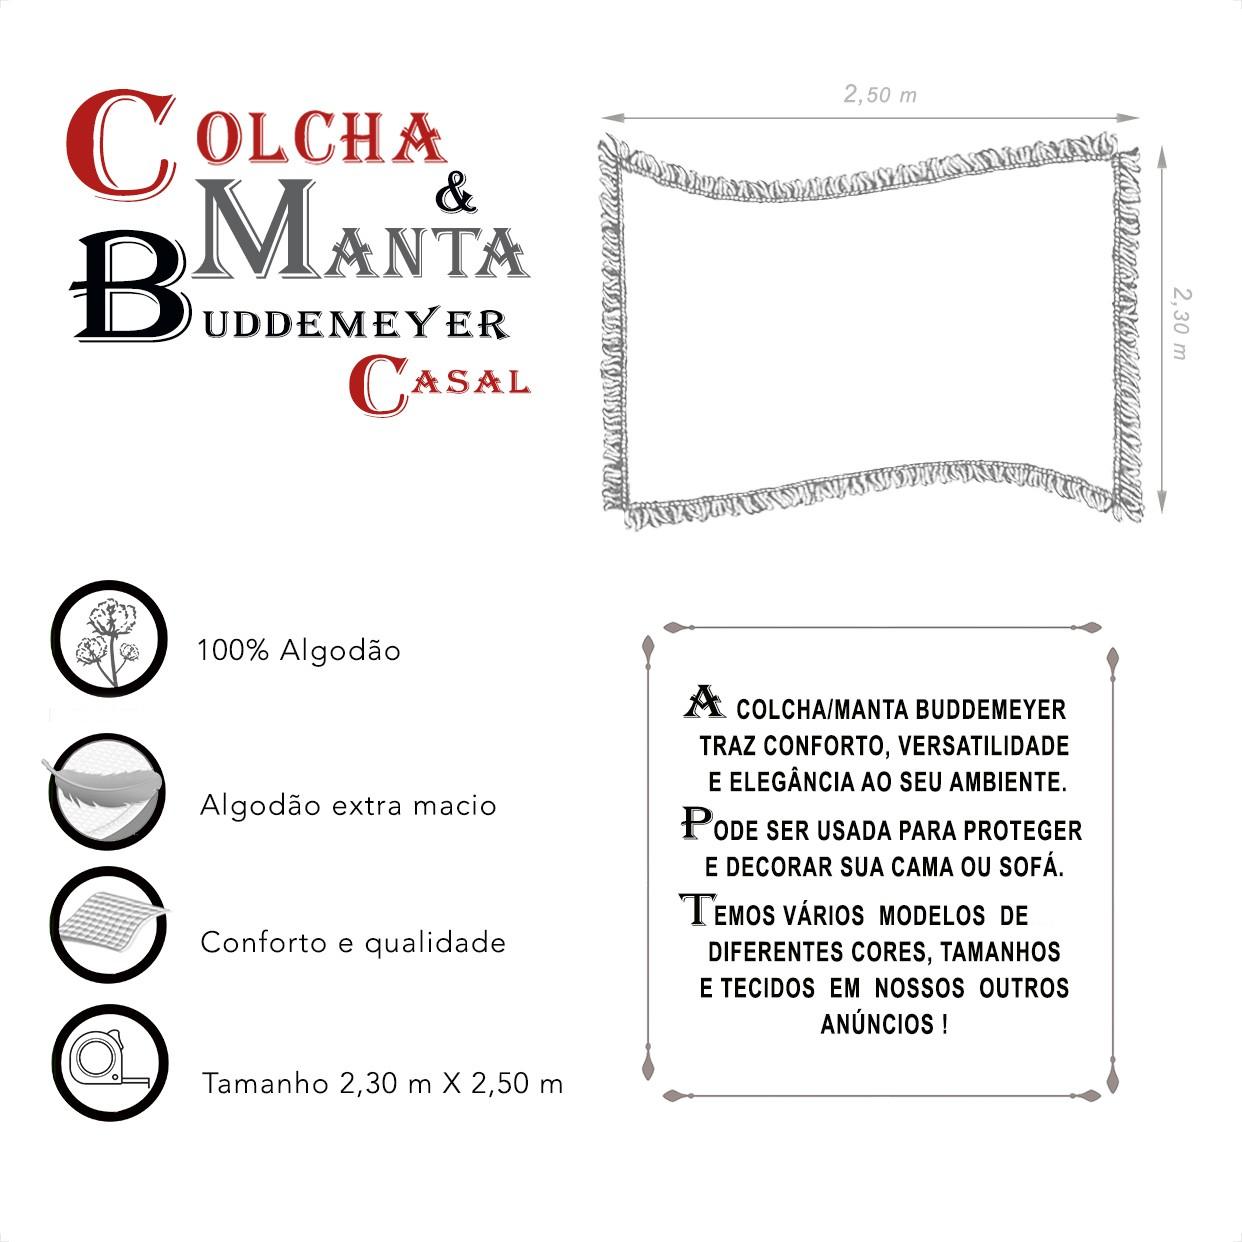 Manta e Colcha Buddemeyer Casal Azul 2,30m x 2,50m